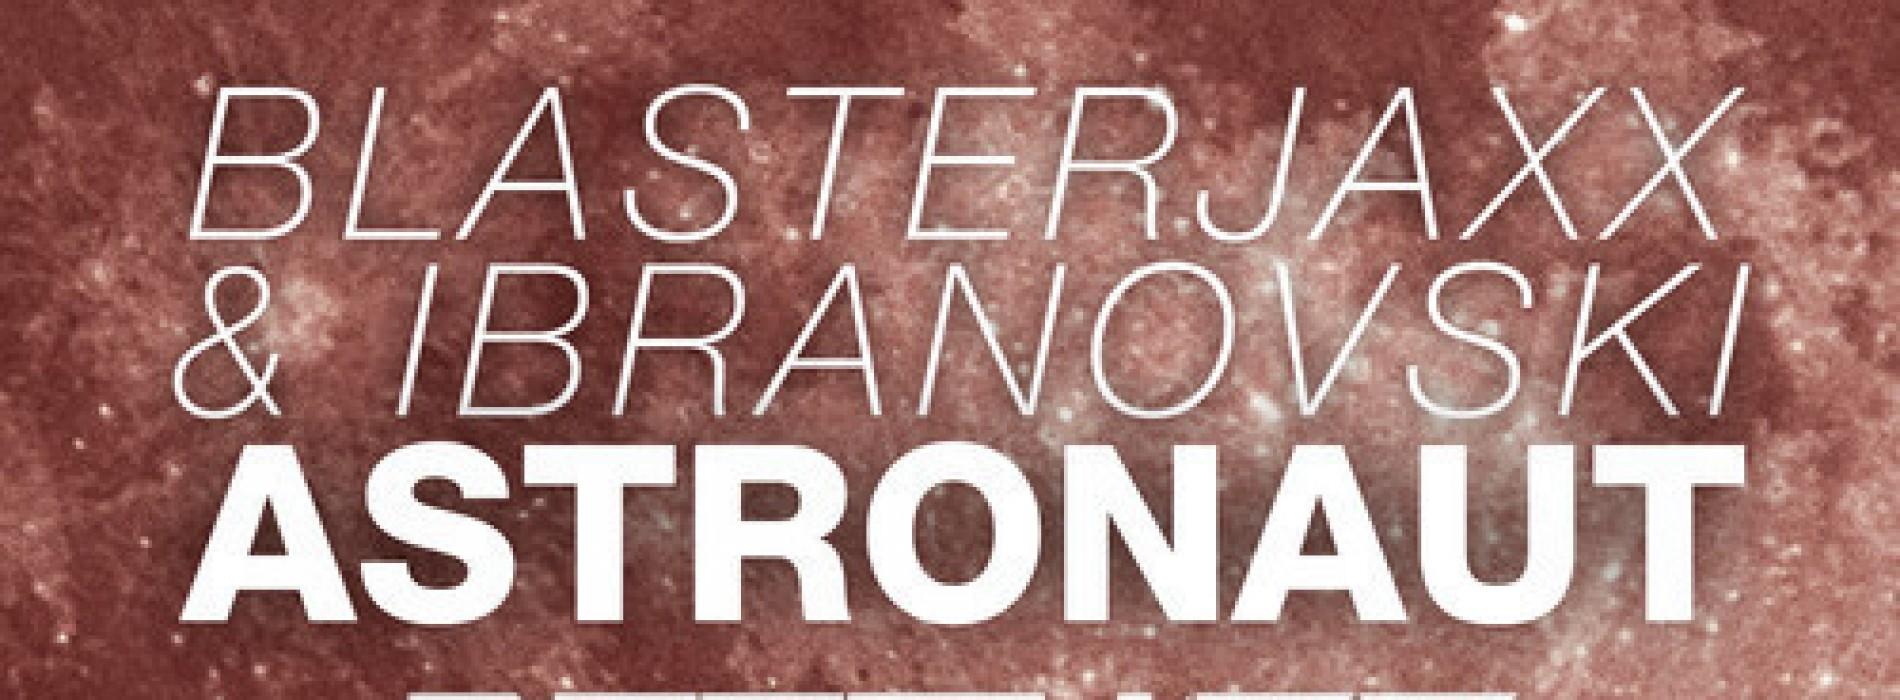 Blasterjaxx & Ibranovski – Astronaut (Dropwizz Festival Bootleg)